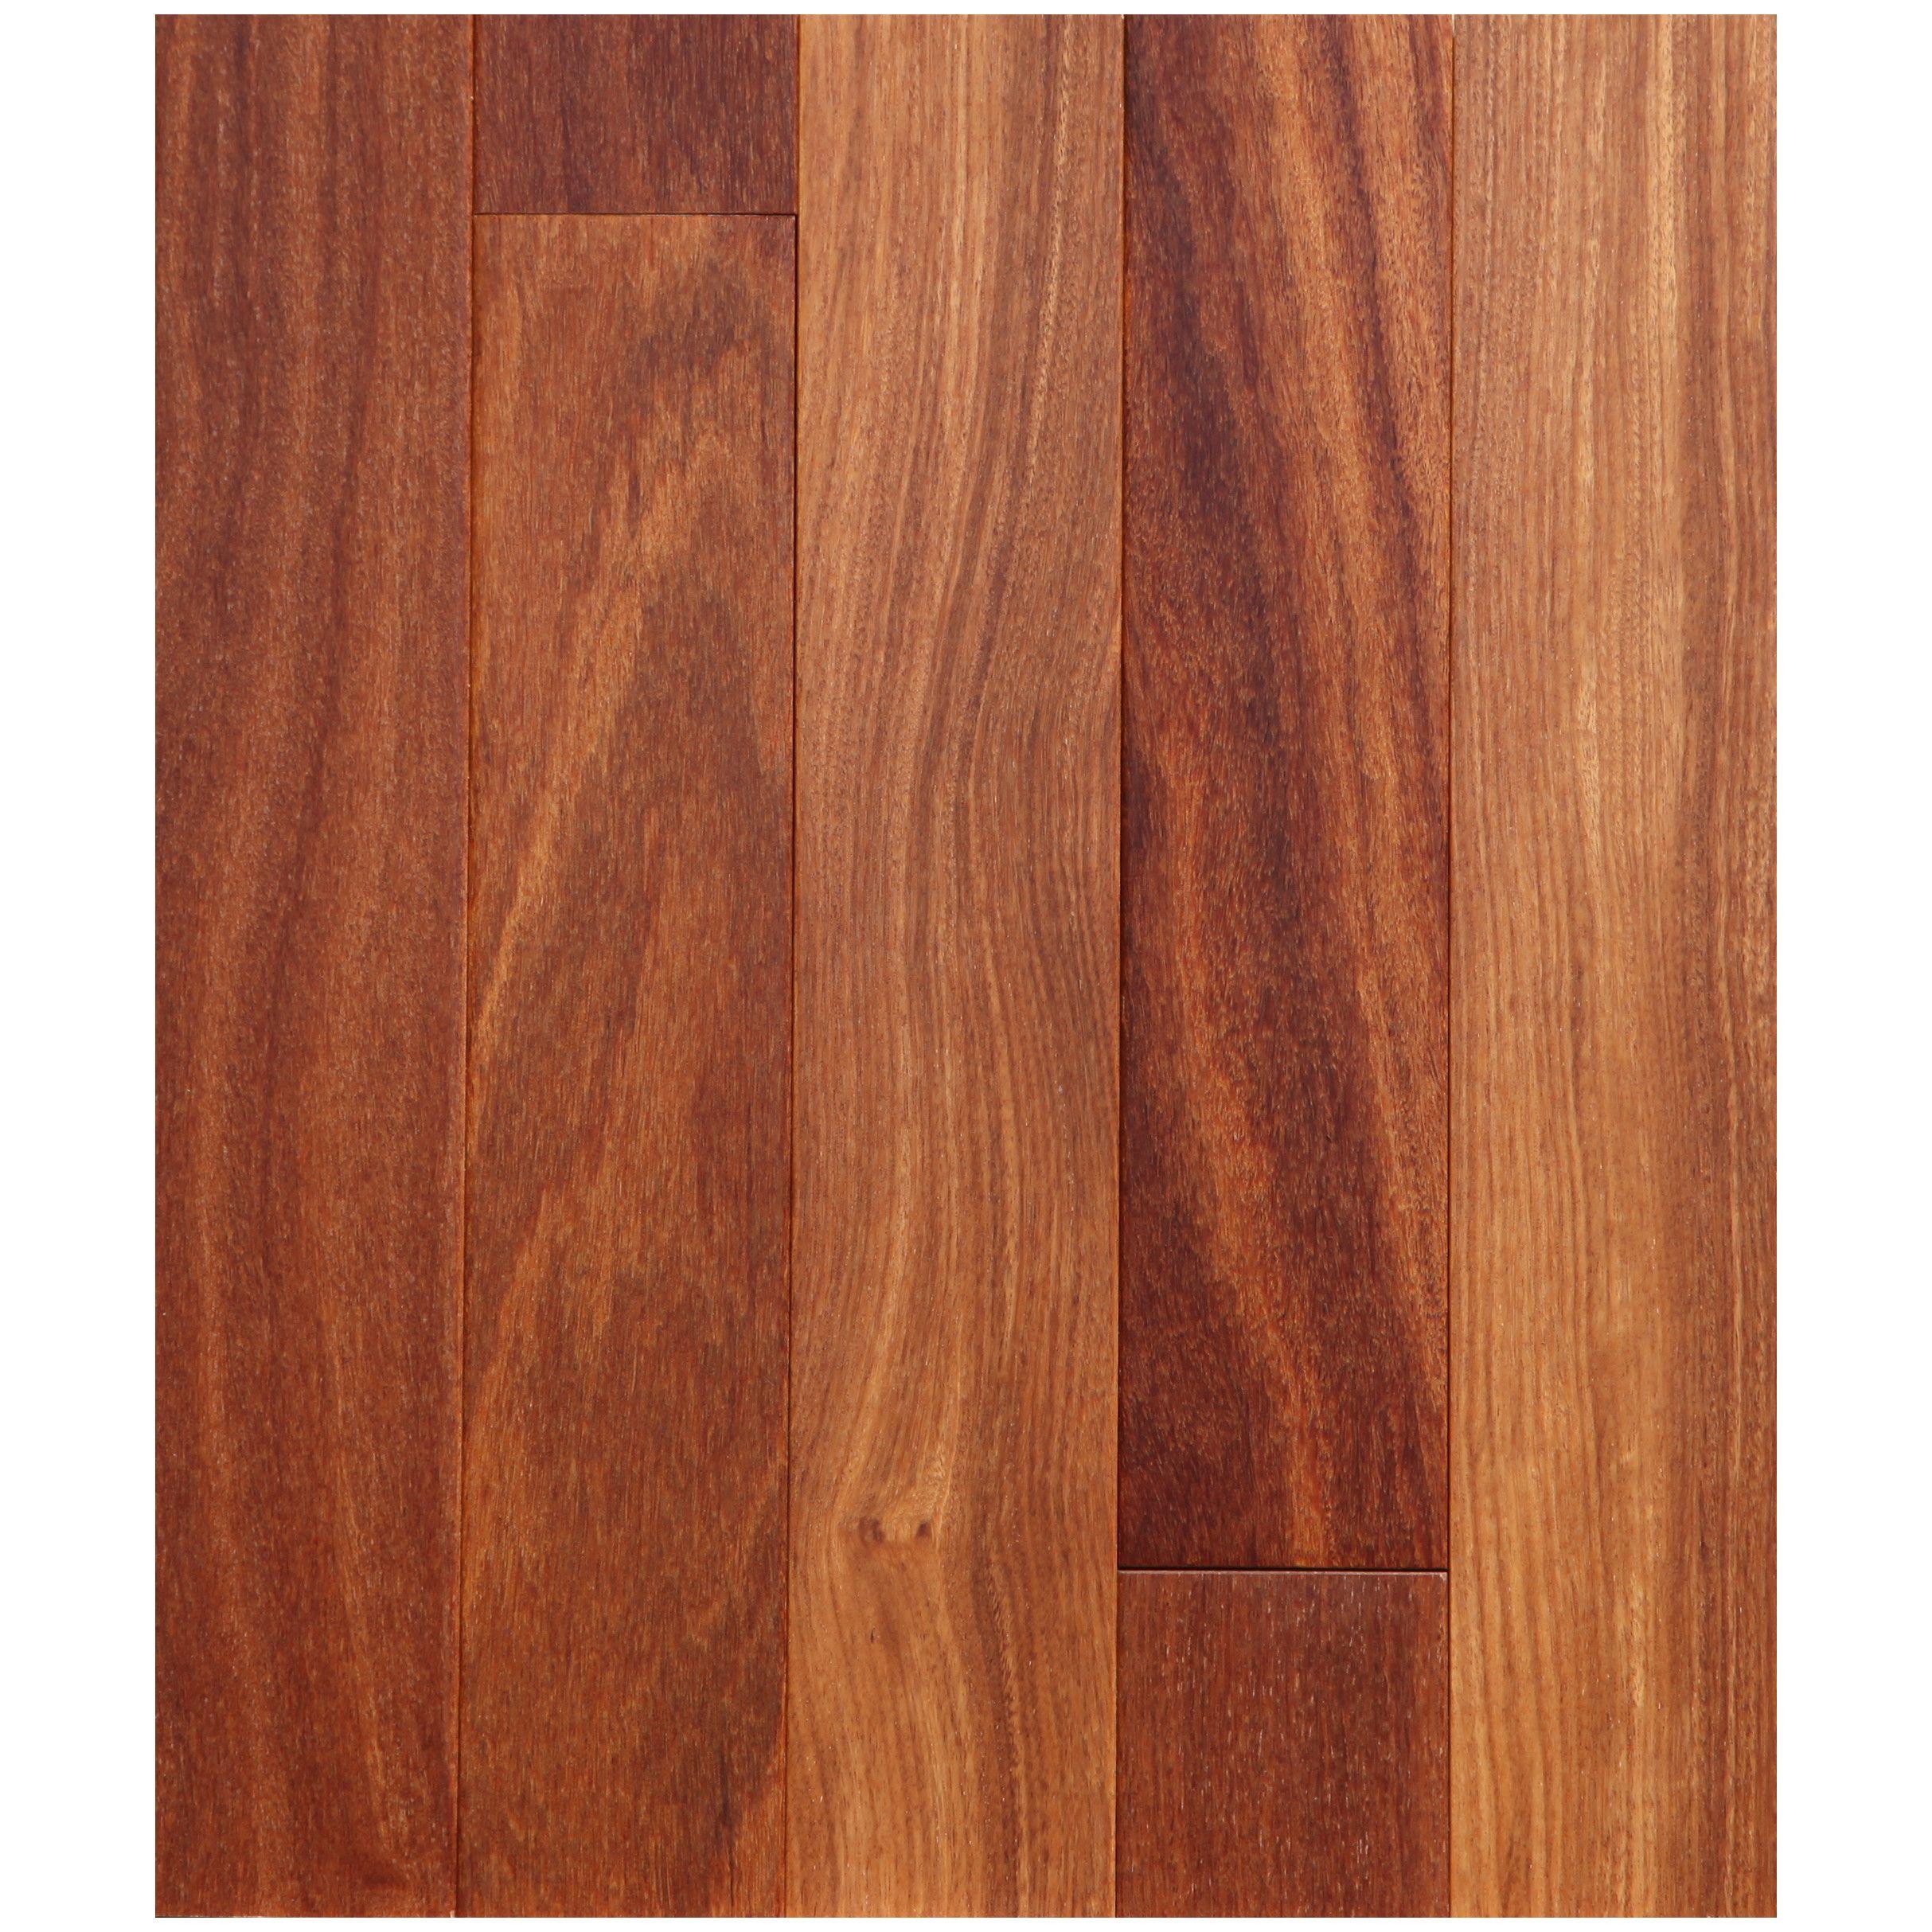 South American Legends Teak 3 4 Thick X 3 1 4 Wide X Varying Length Solid Hardwood Flooring Hardwood Floors Solid Hardwood Floors Engineered Hardwood Flooring